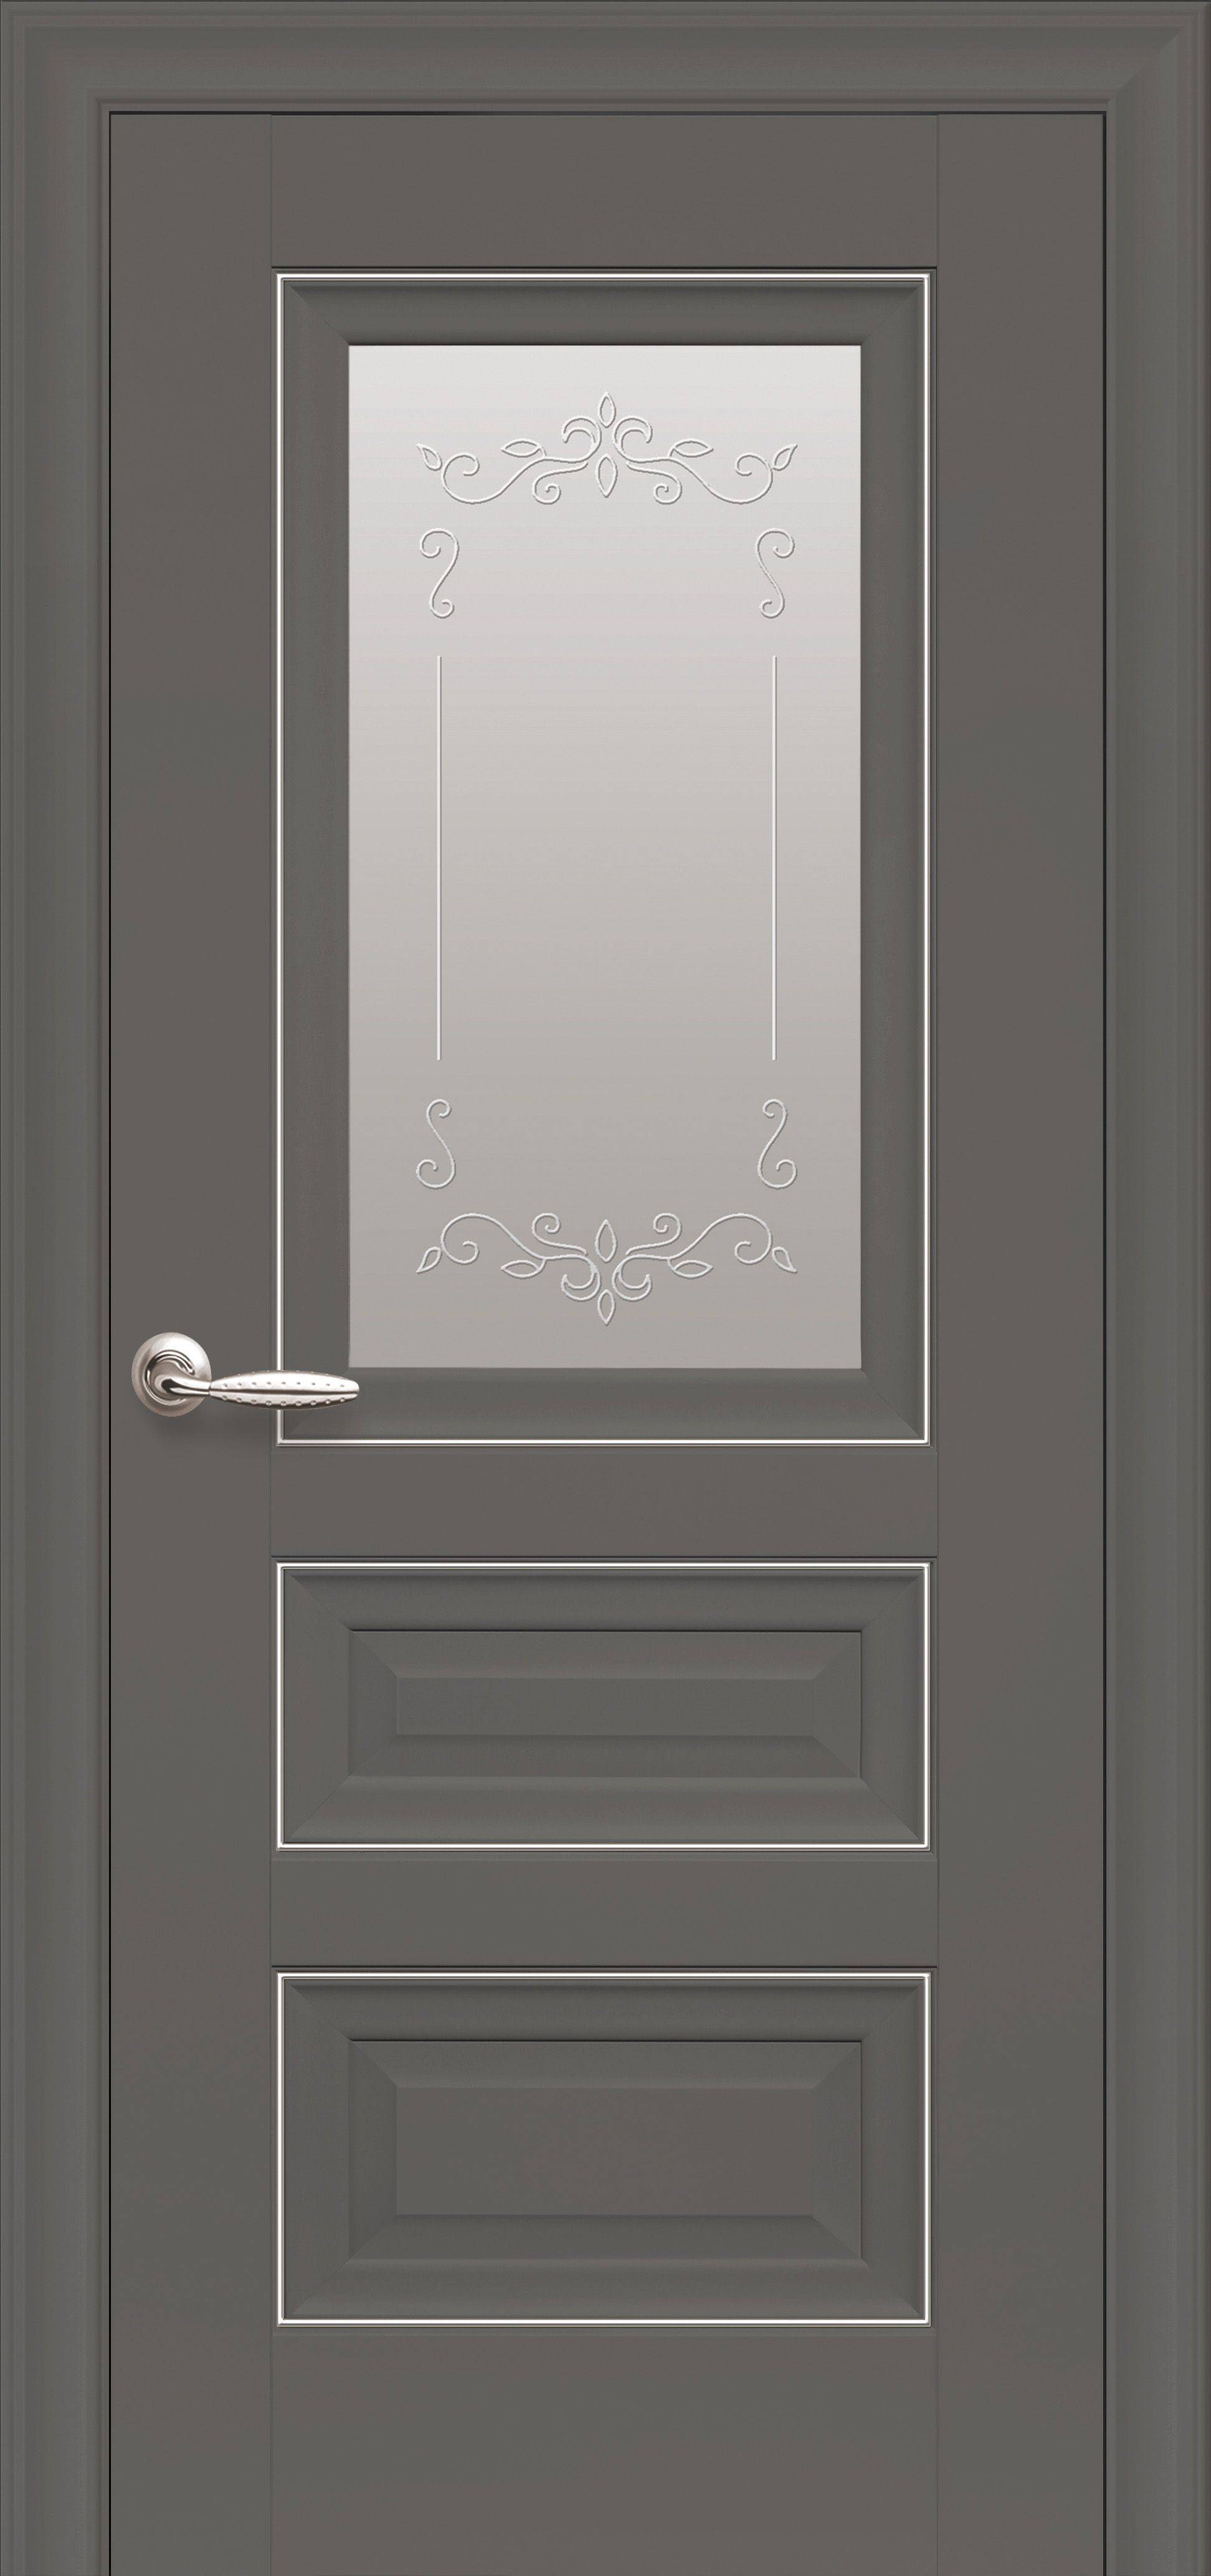 Межкомнатные двери Статус Со стеклом сатин, молдингом и рисунком